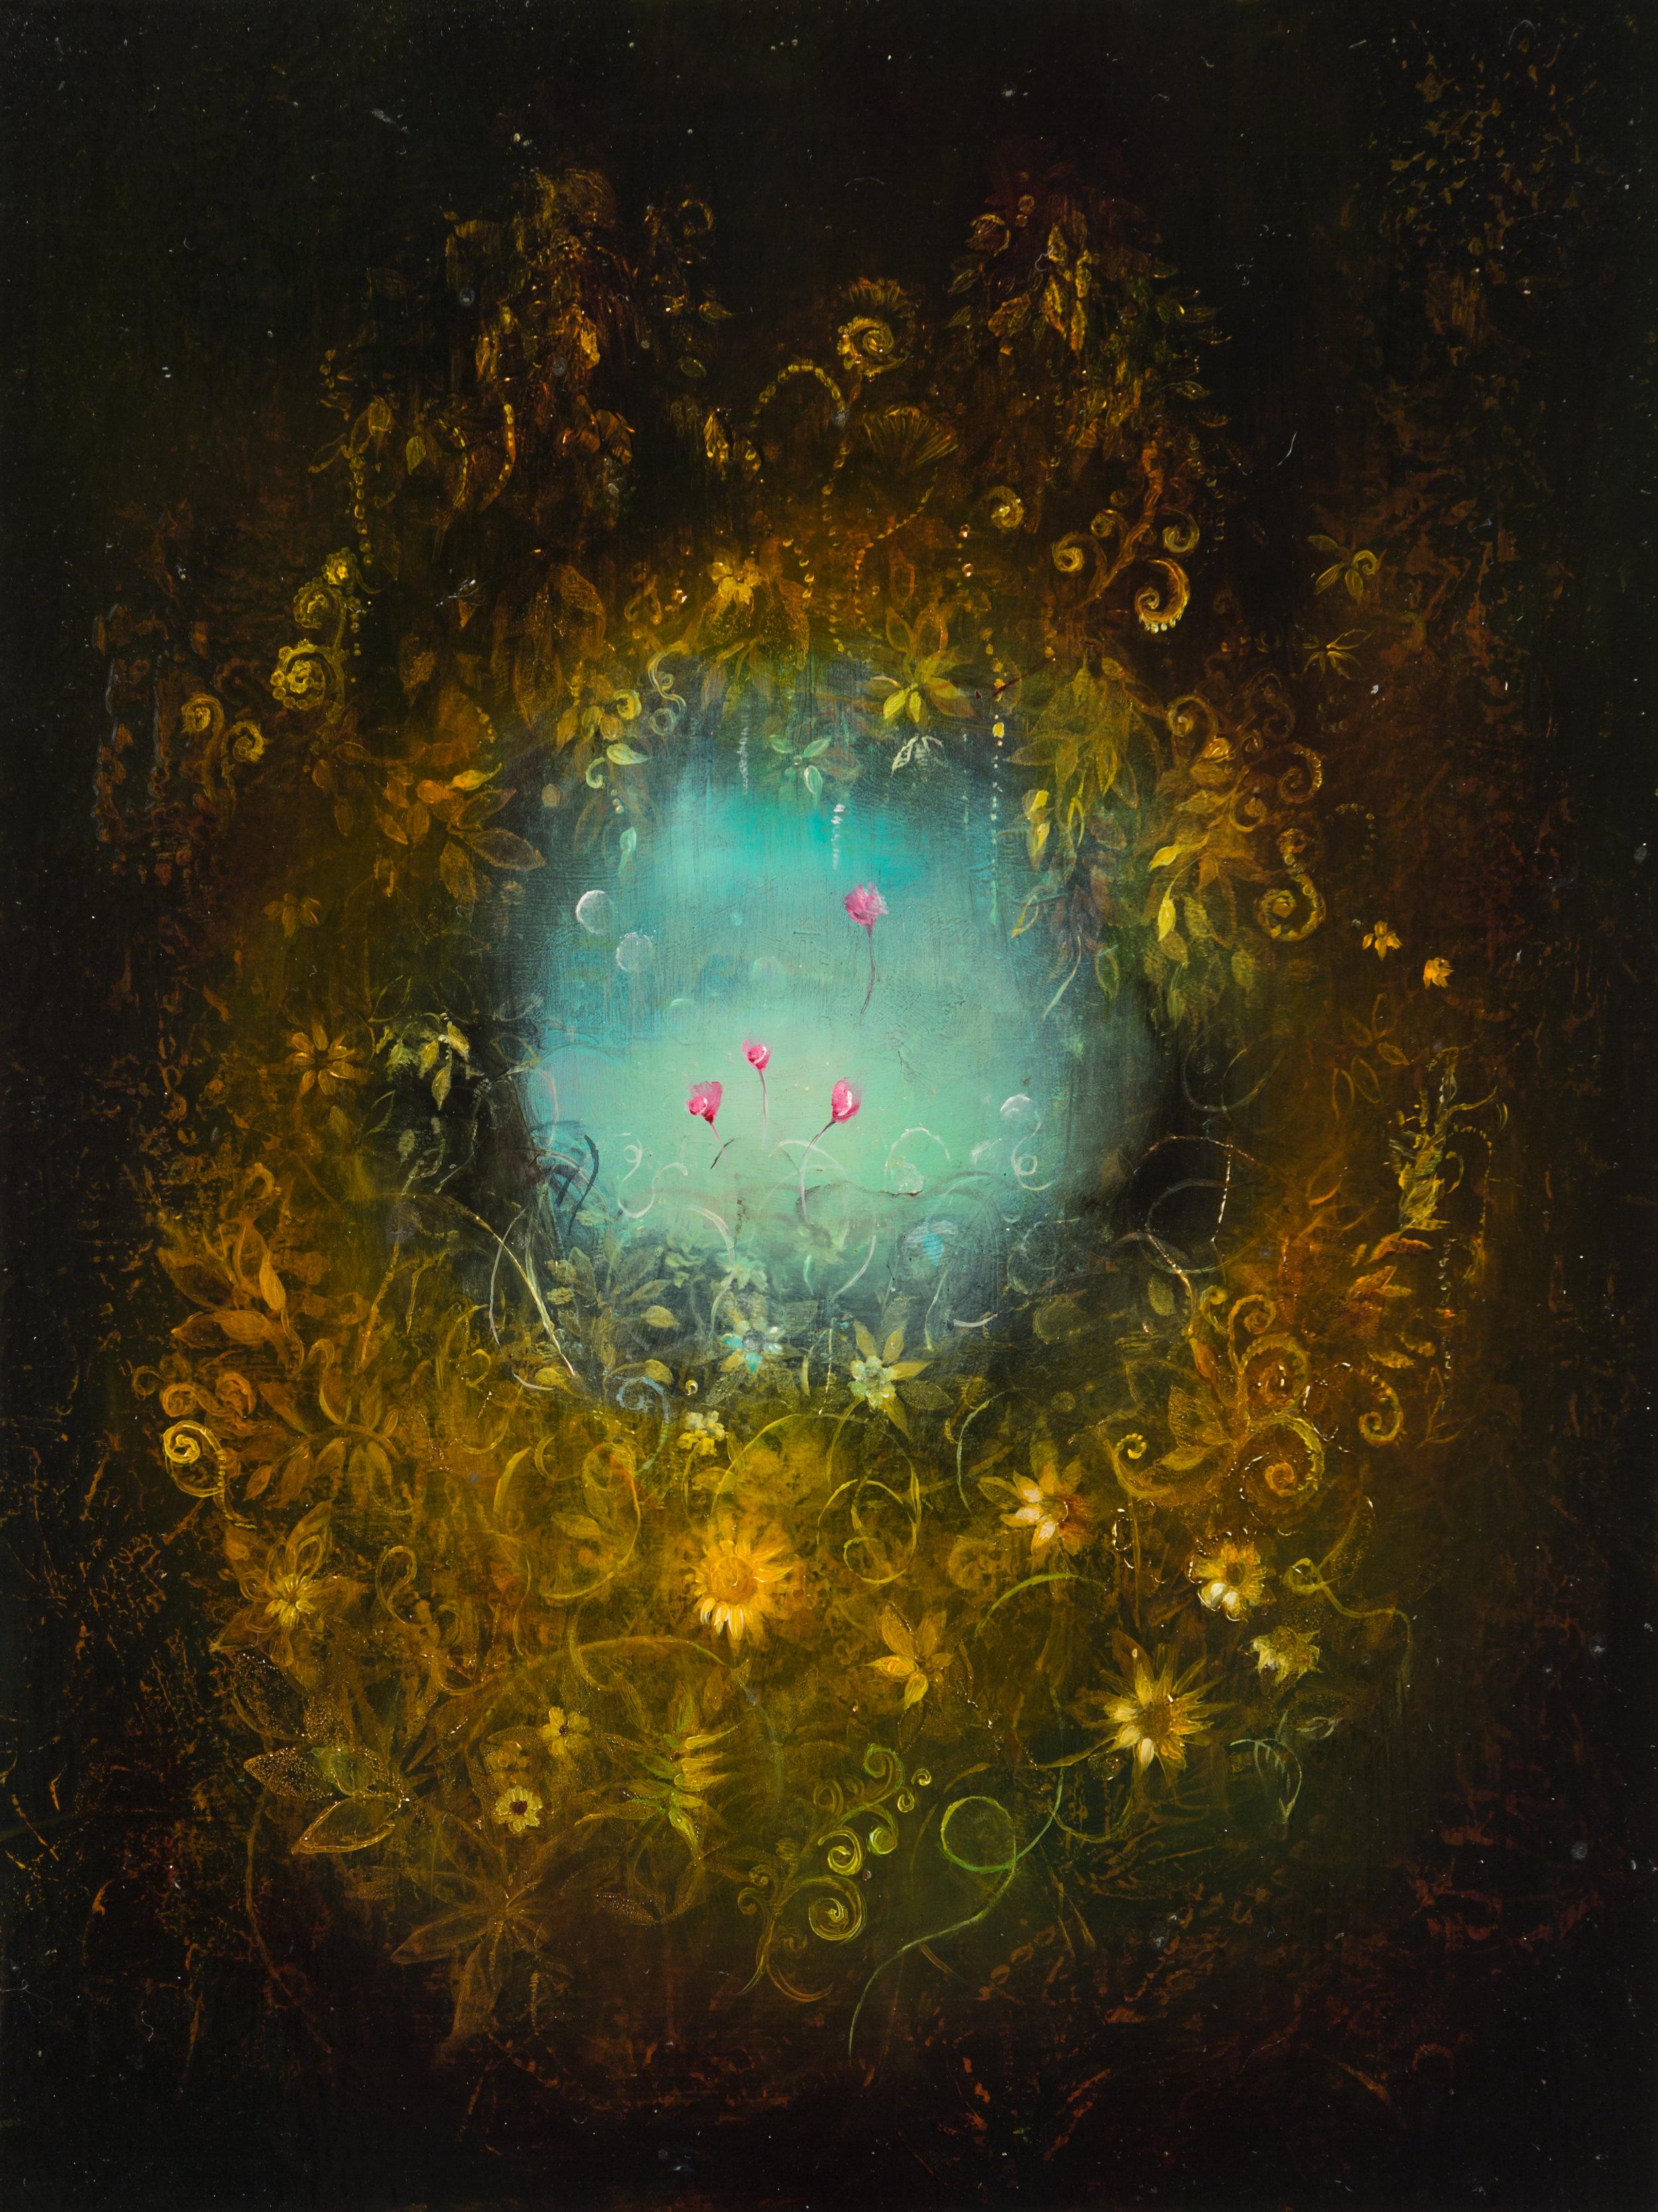 Dwell, Oil on panel, 9x7, 2017